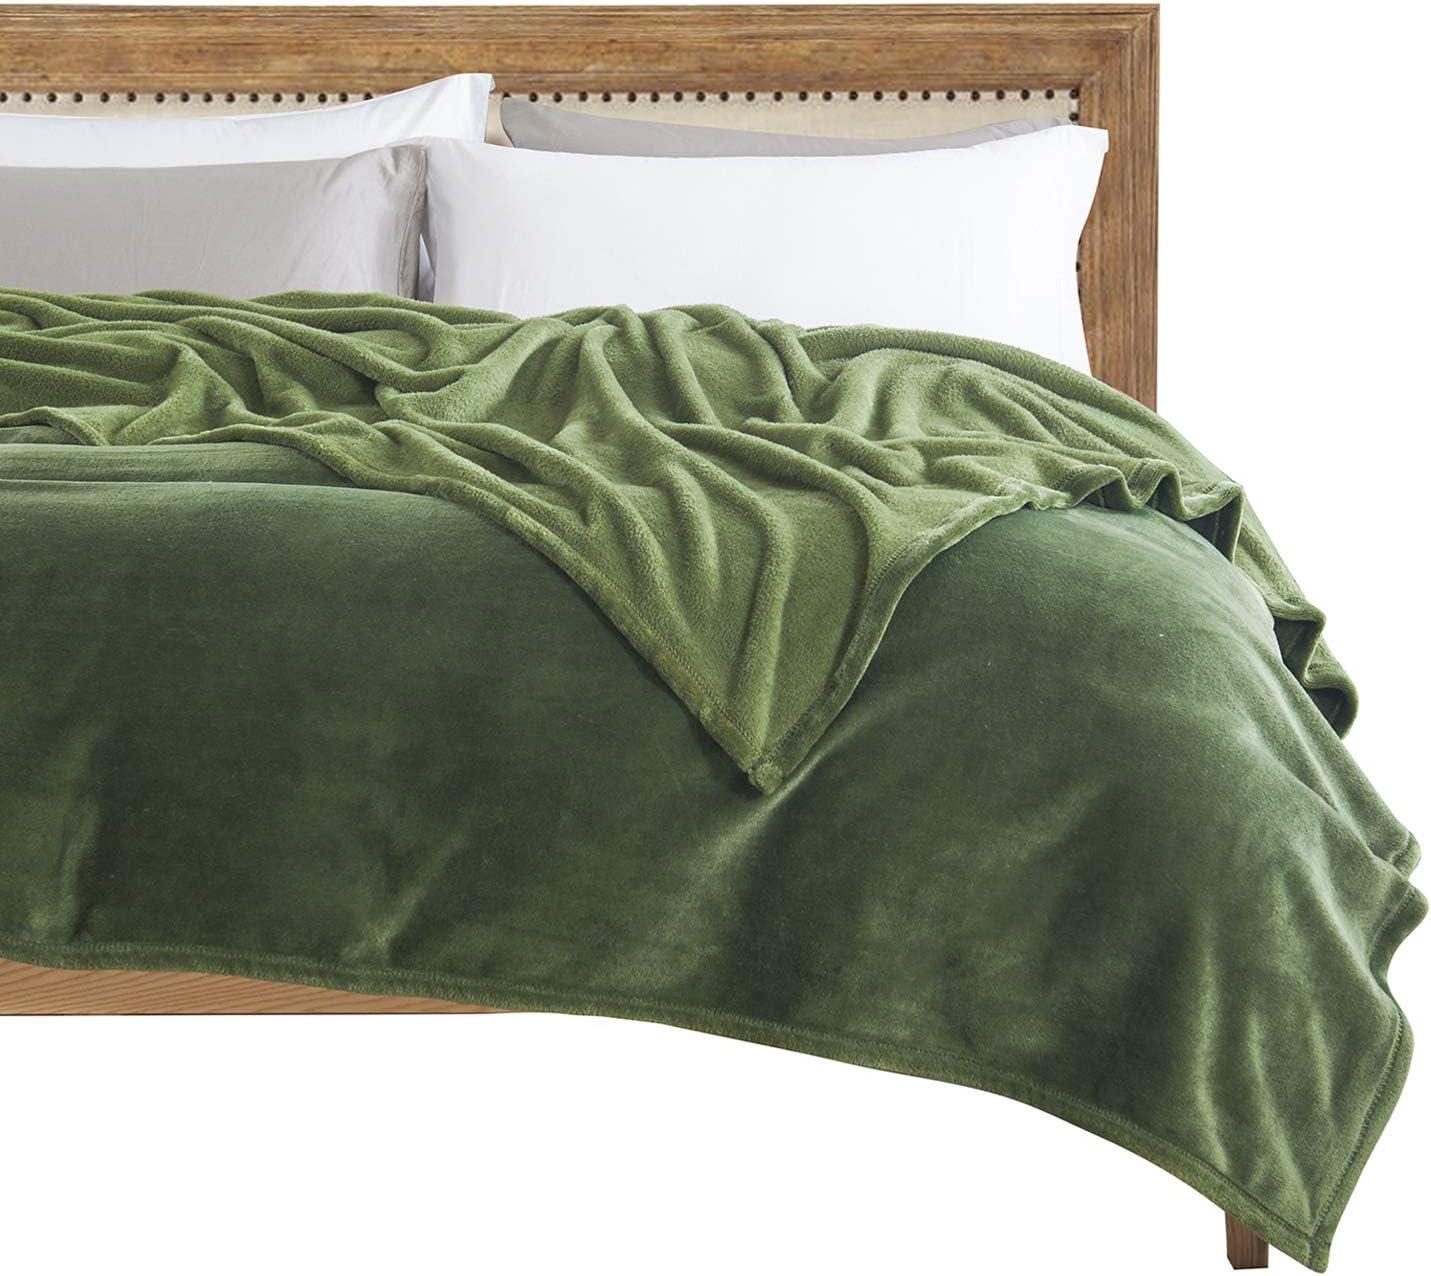 Bargain Ponvunory Large Flannel Fleece Plush Special price Blanket 50